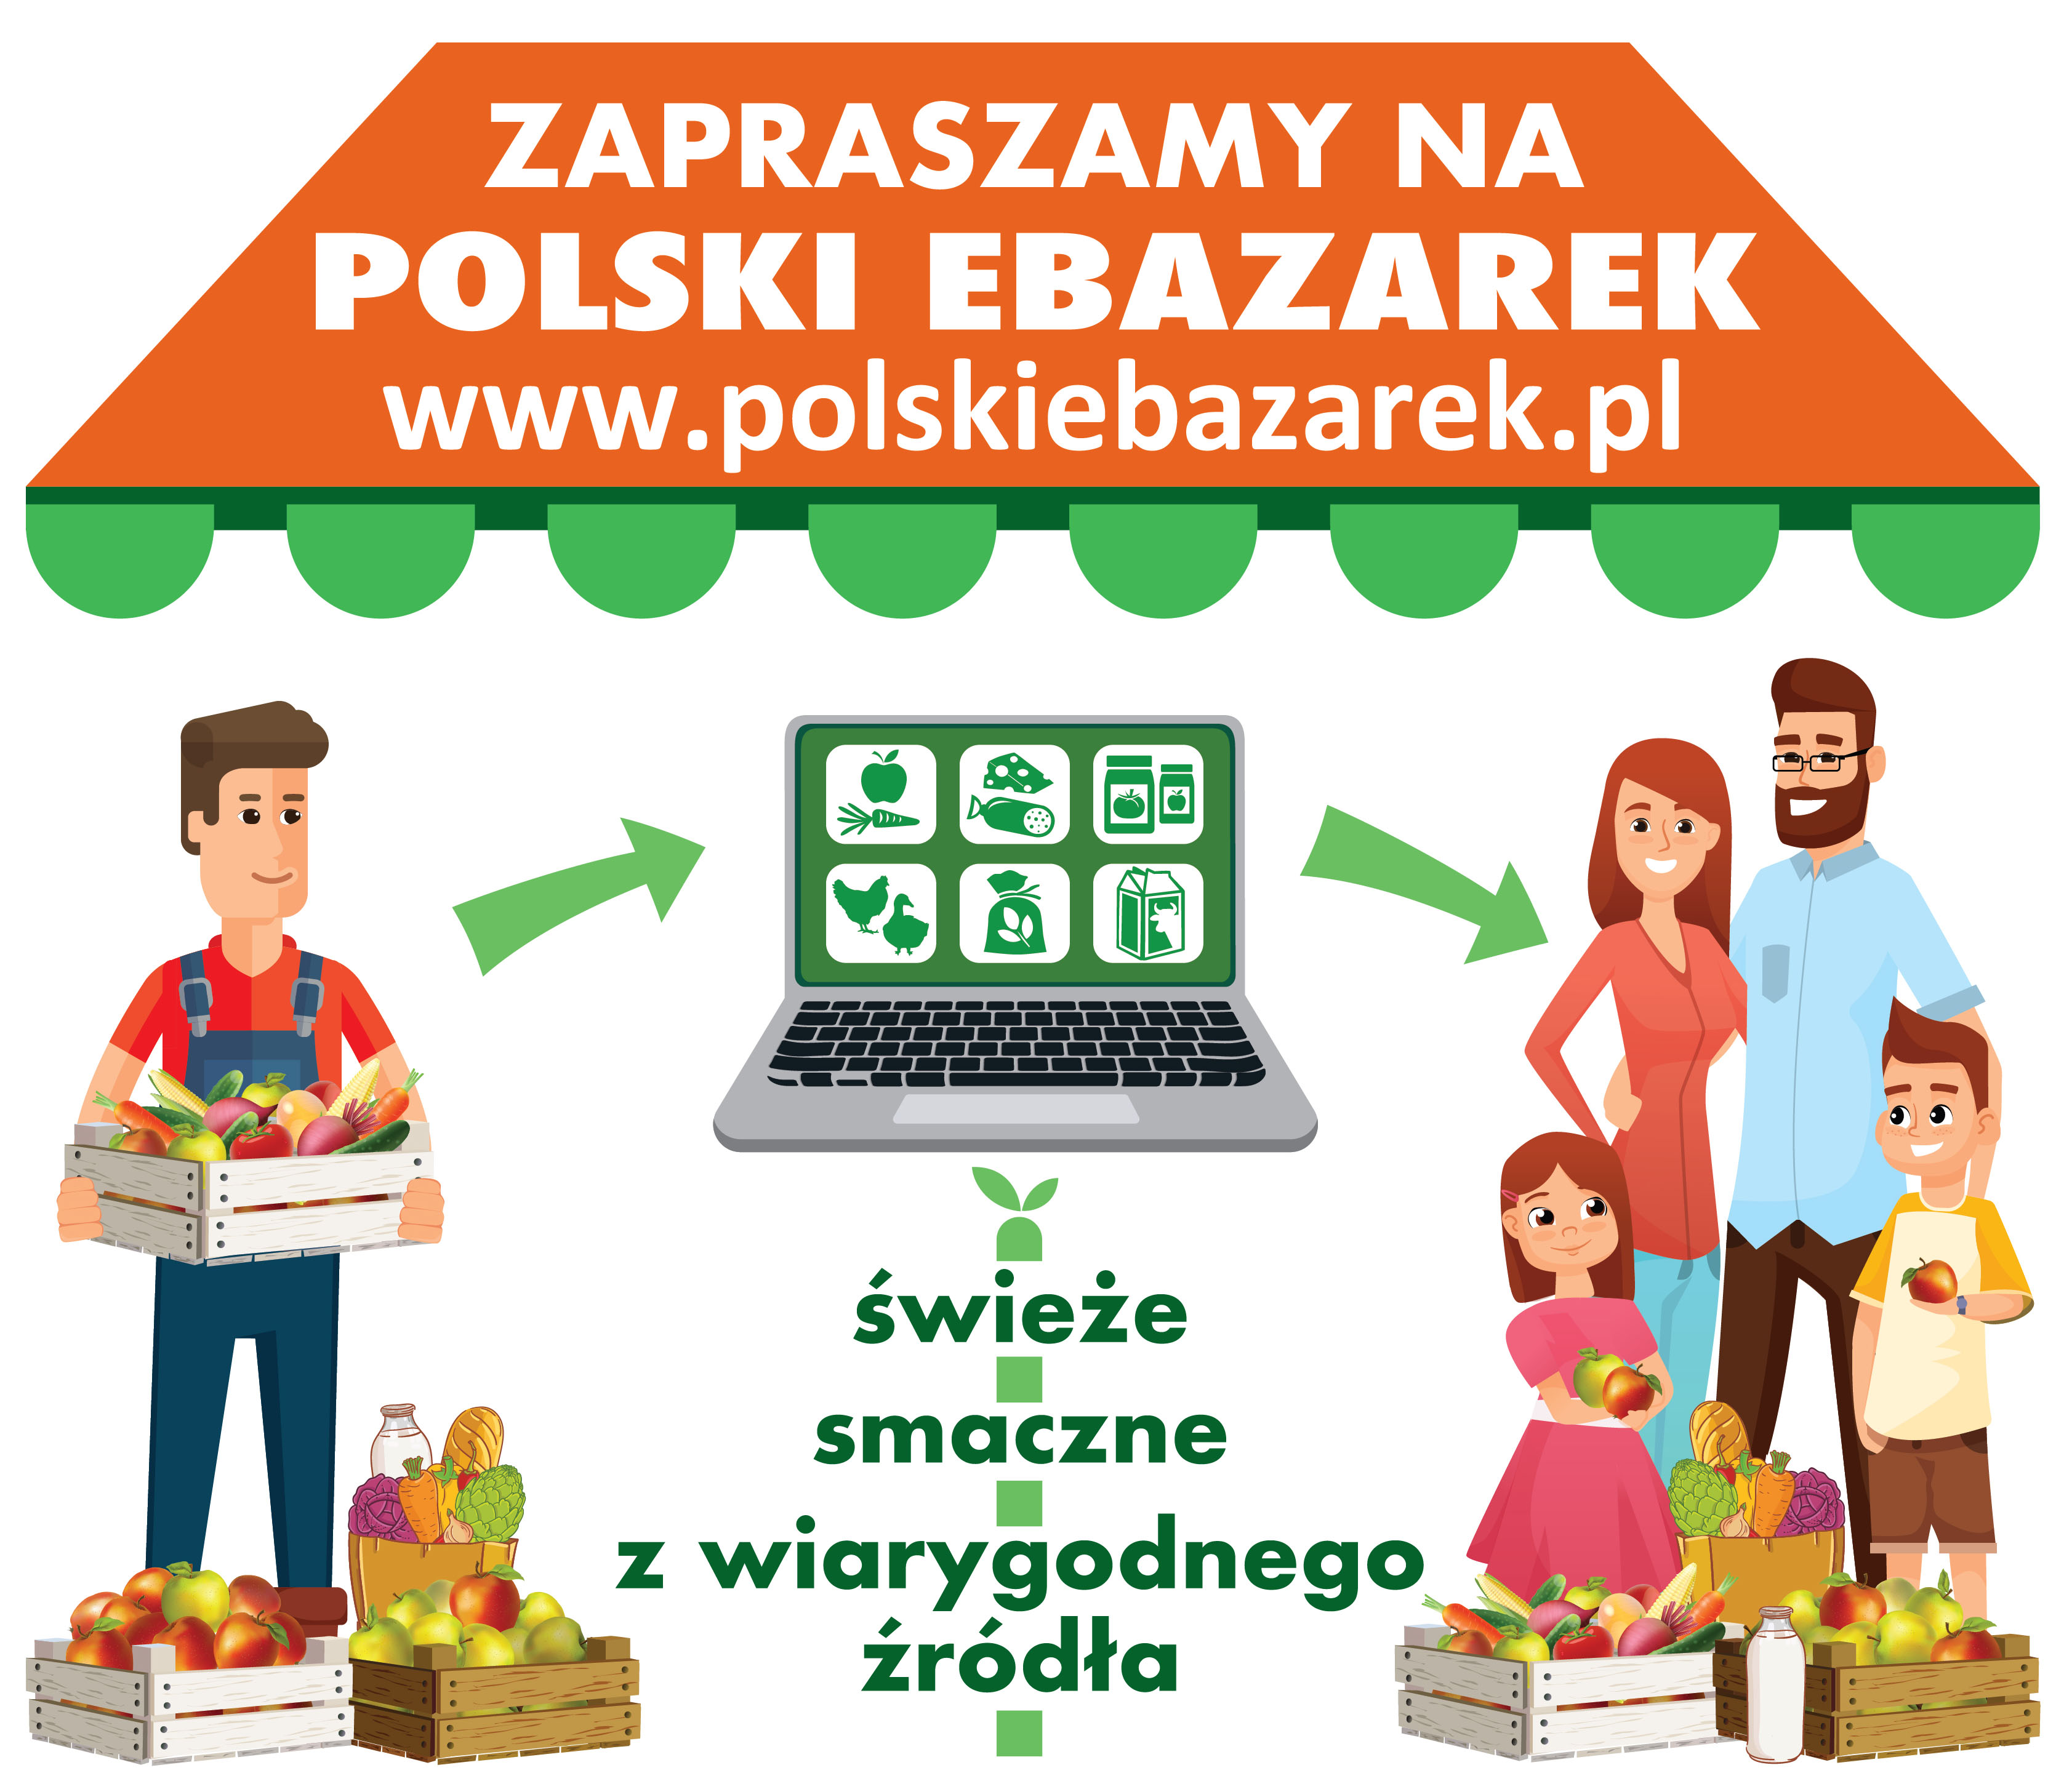 PLAKAT-A3 polskiebazarek-1 (2)